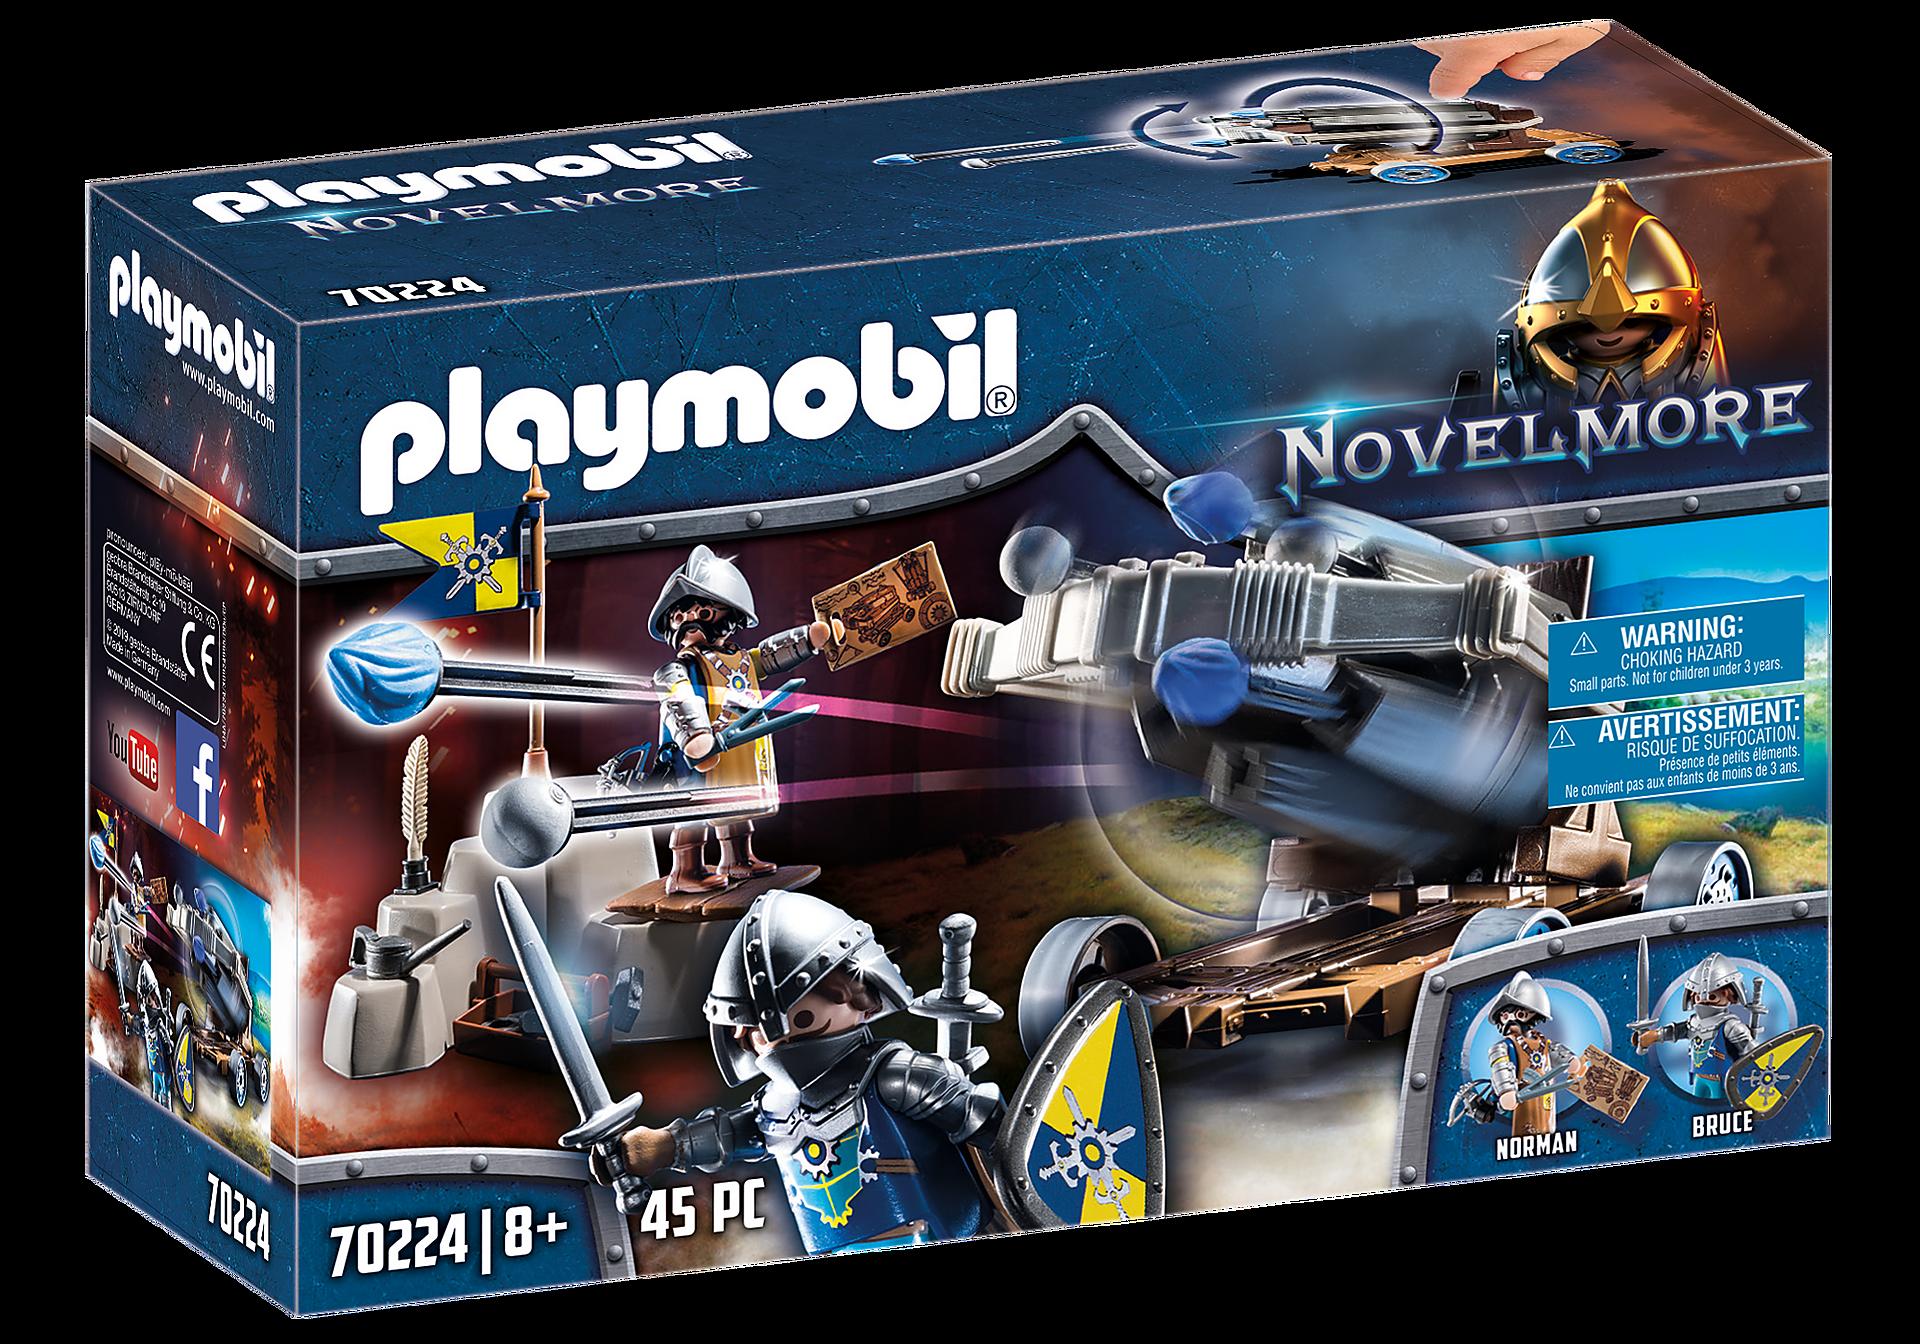 Playmobil - Water Ballista (70224)